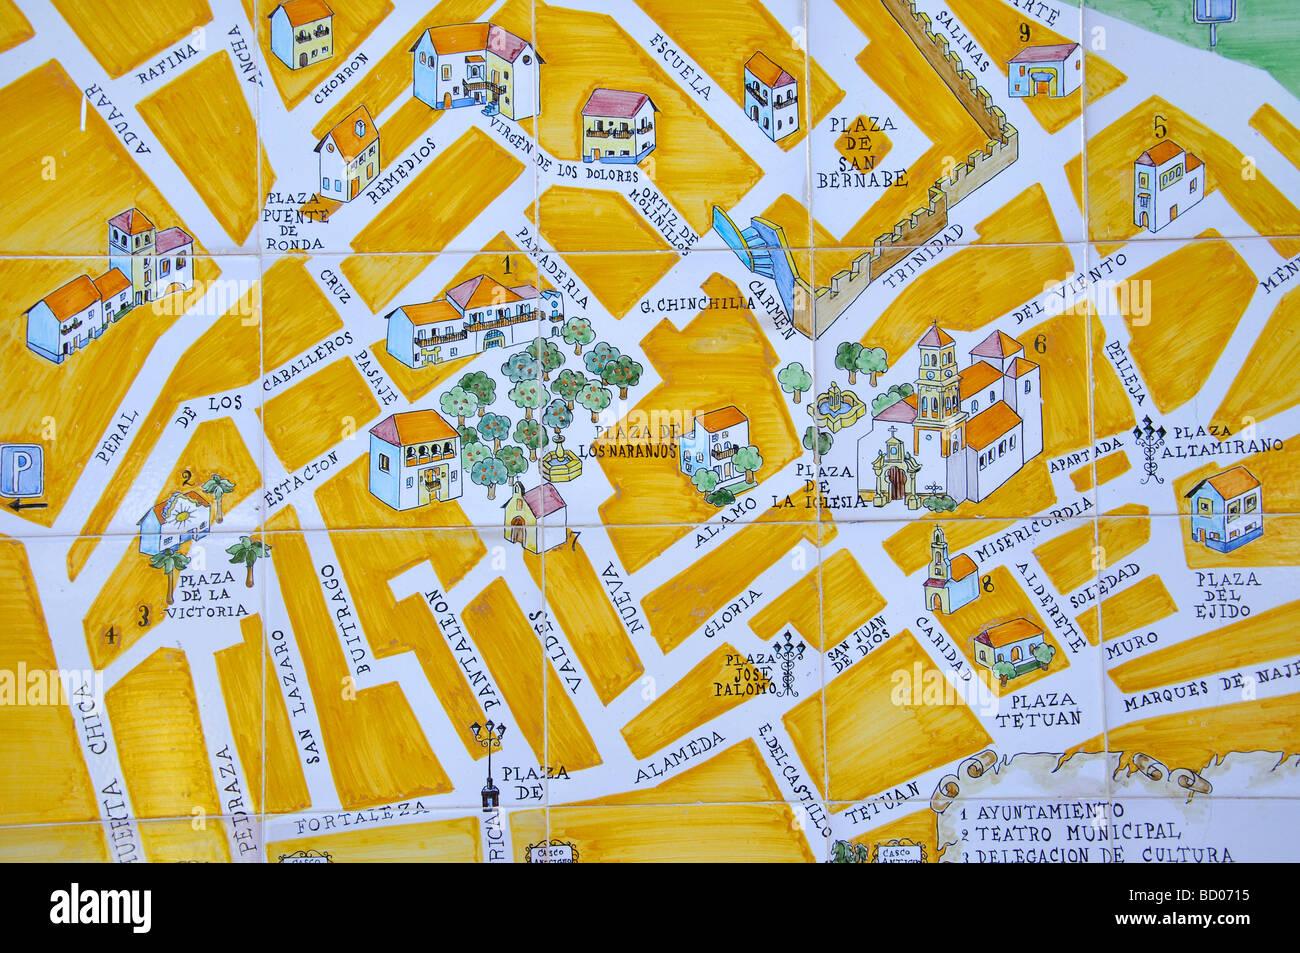 Malaga Karte Spanien.Keramische Karte Von Old Town Plaza De Los Naranjos